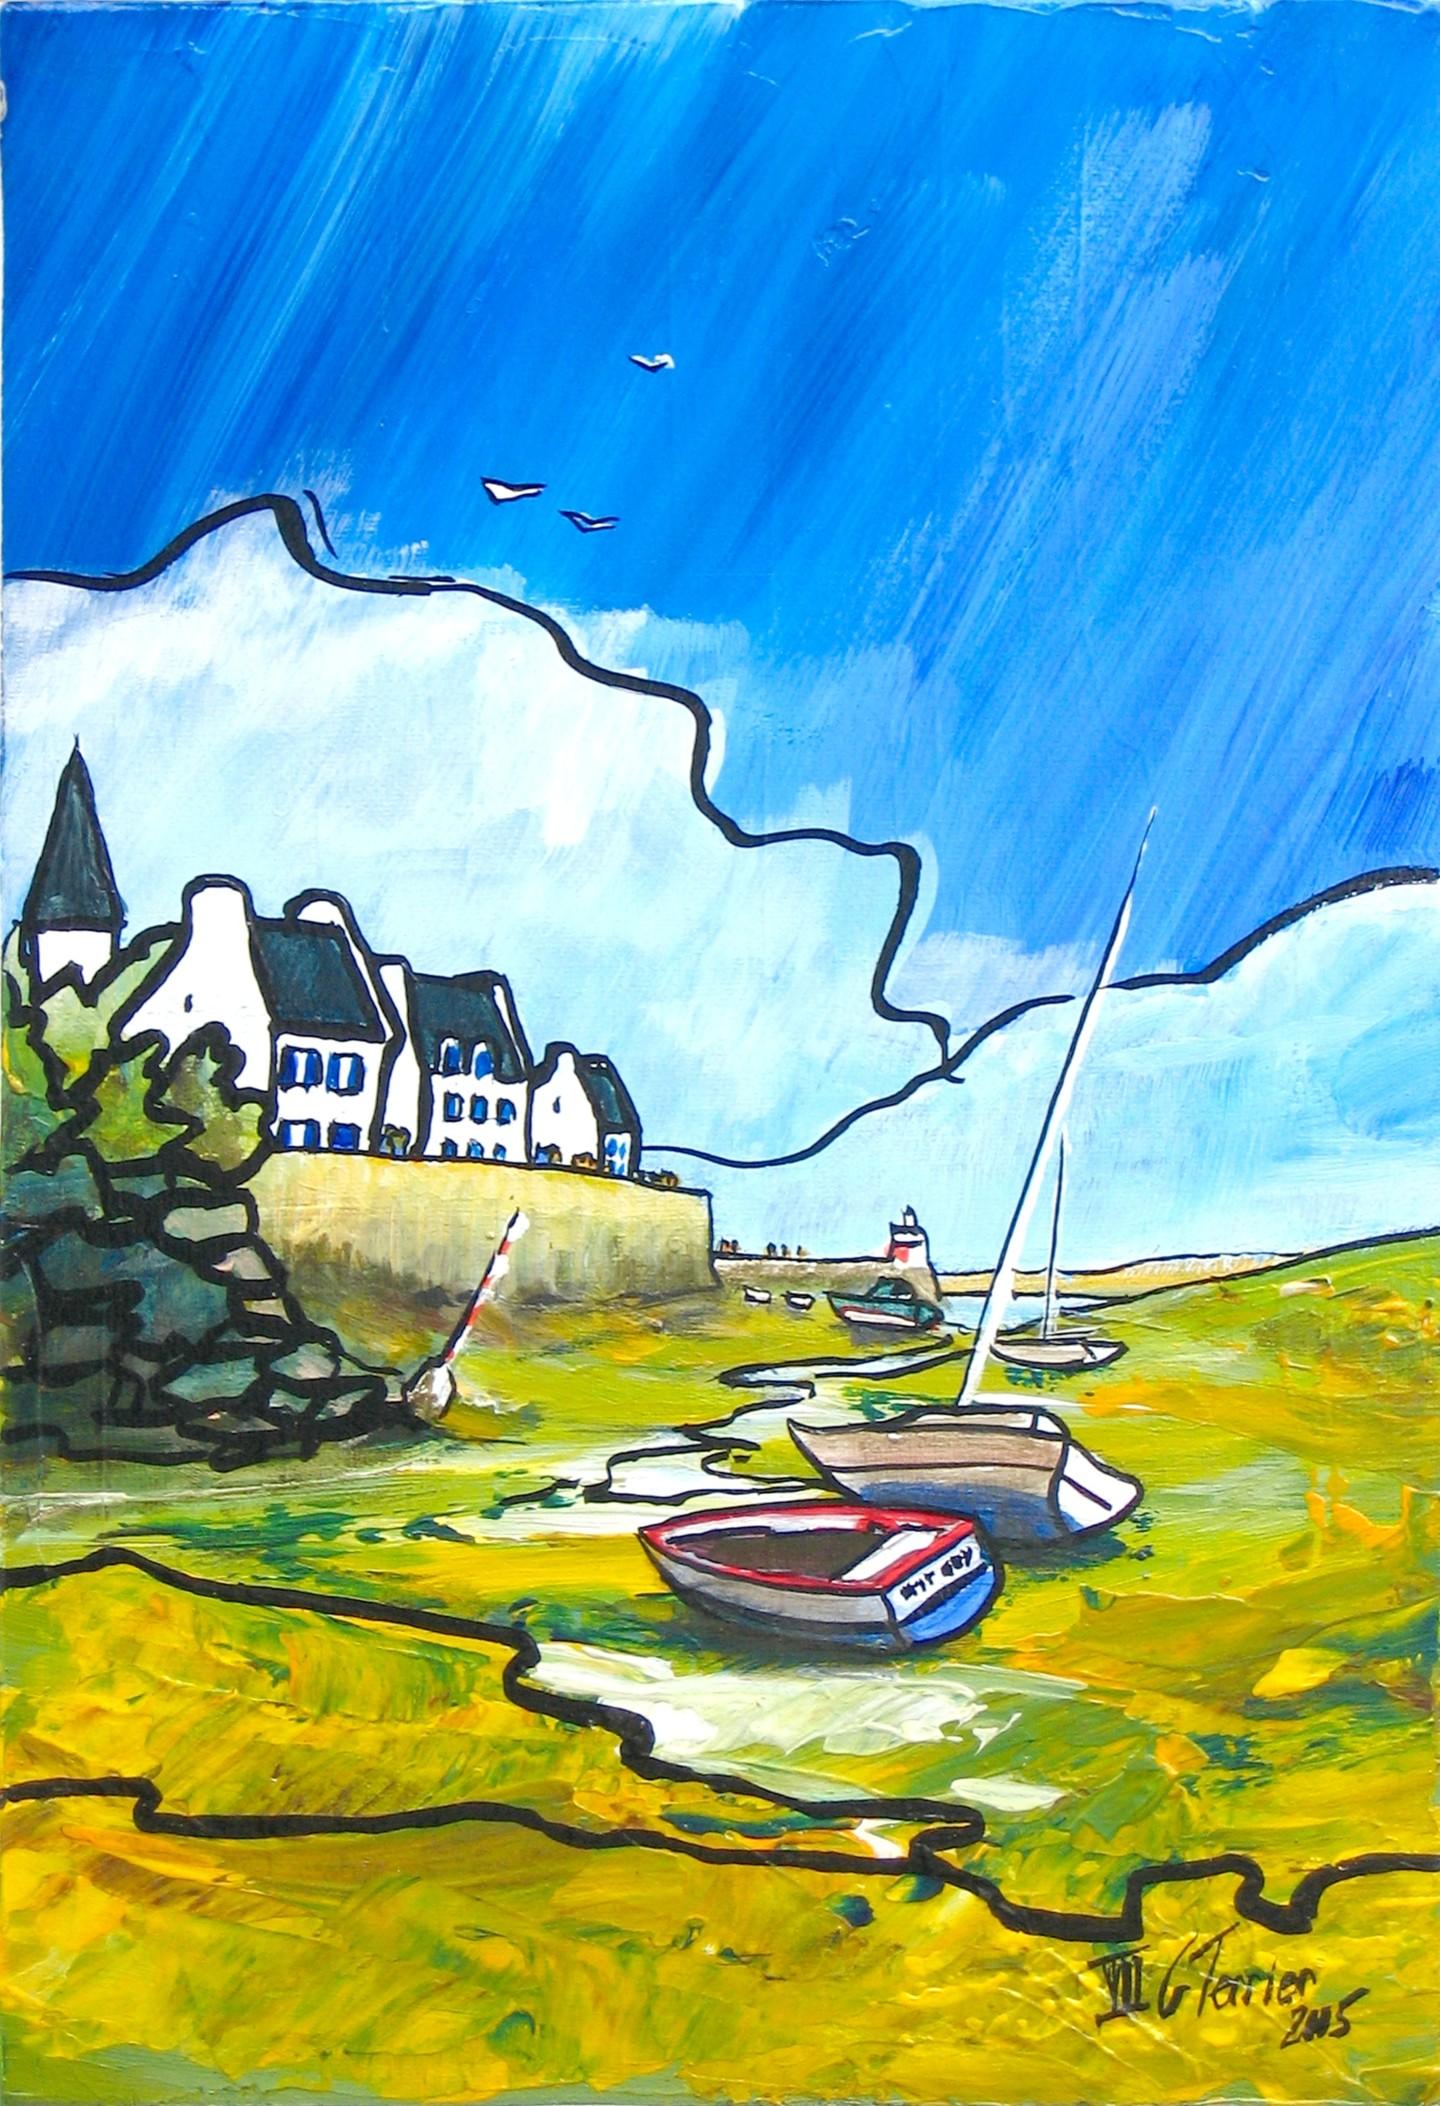 Guy Terrier - En attendant la marée